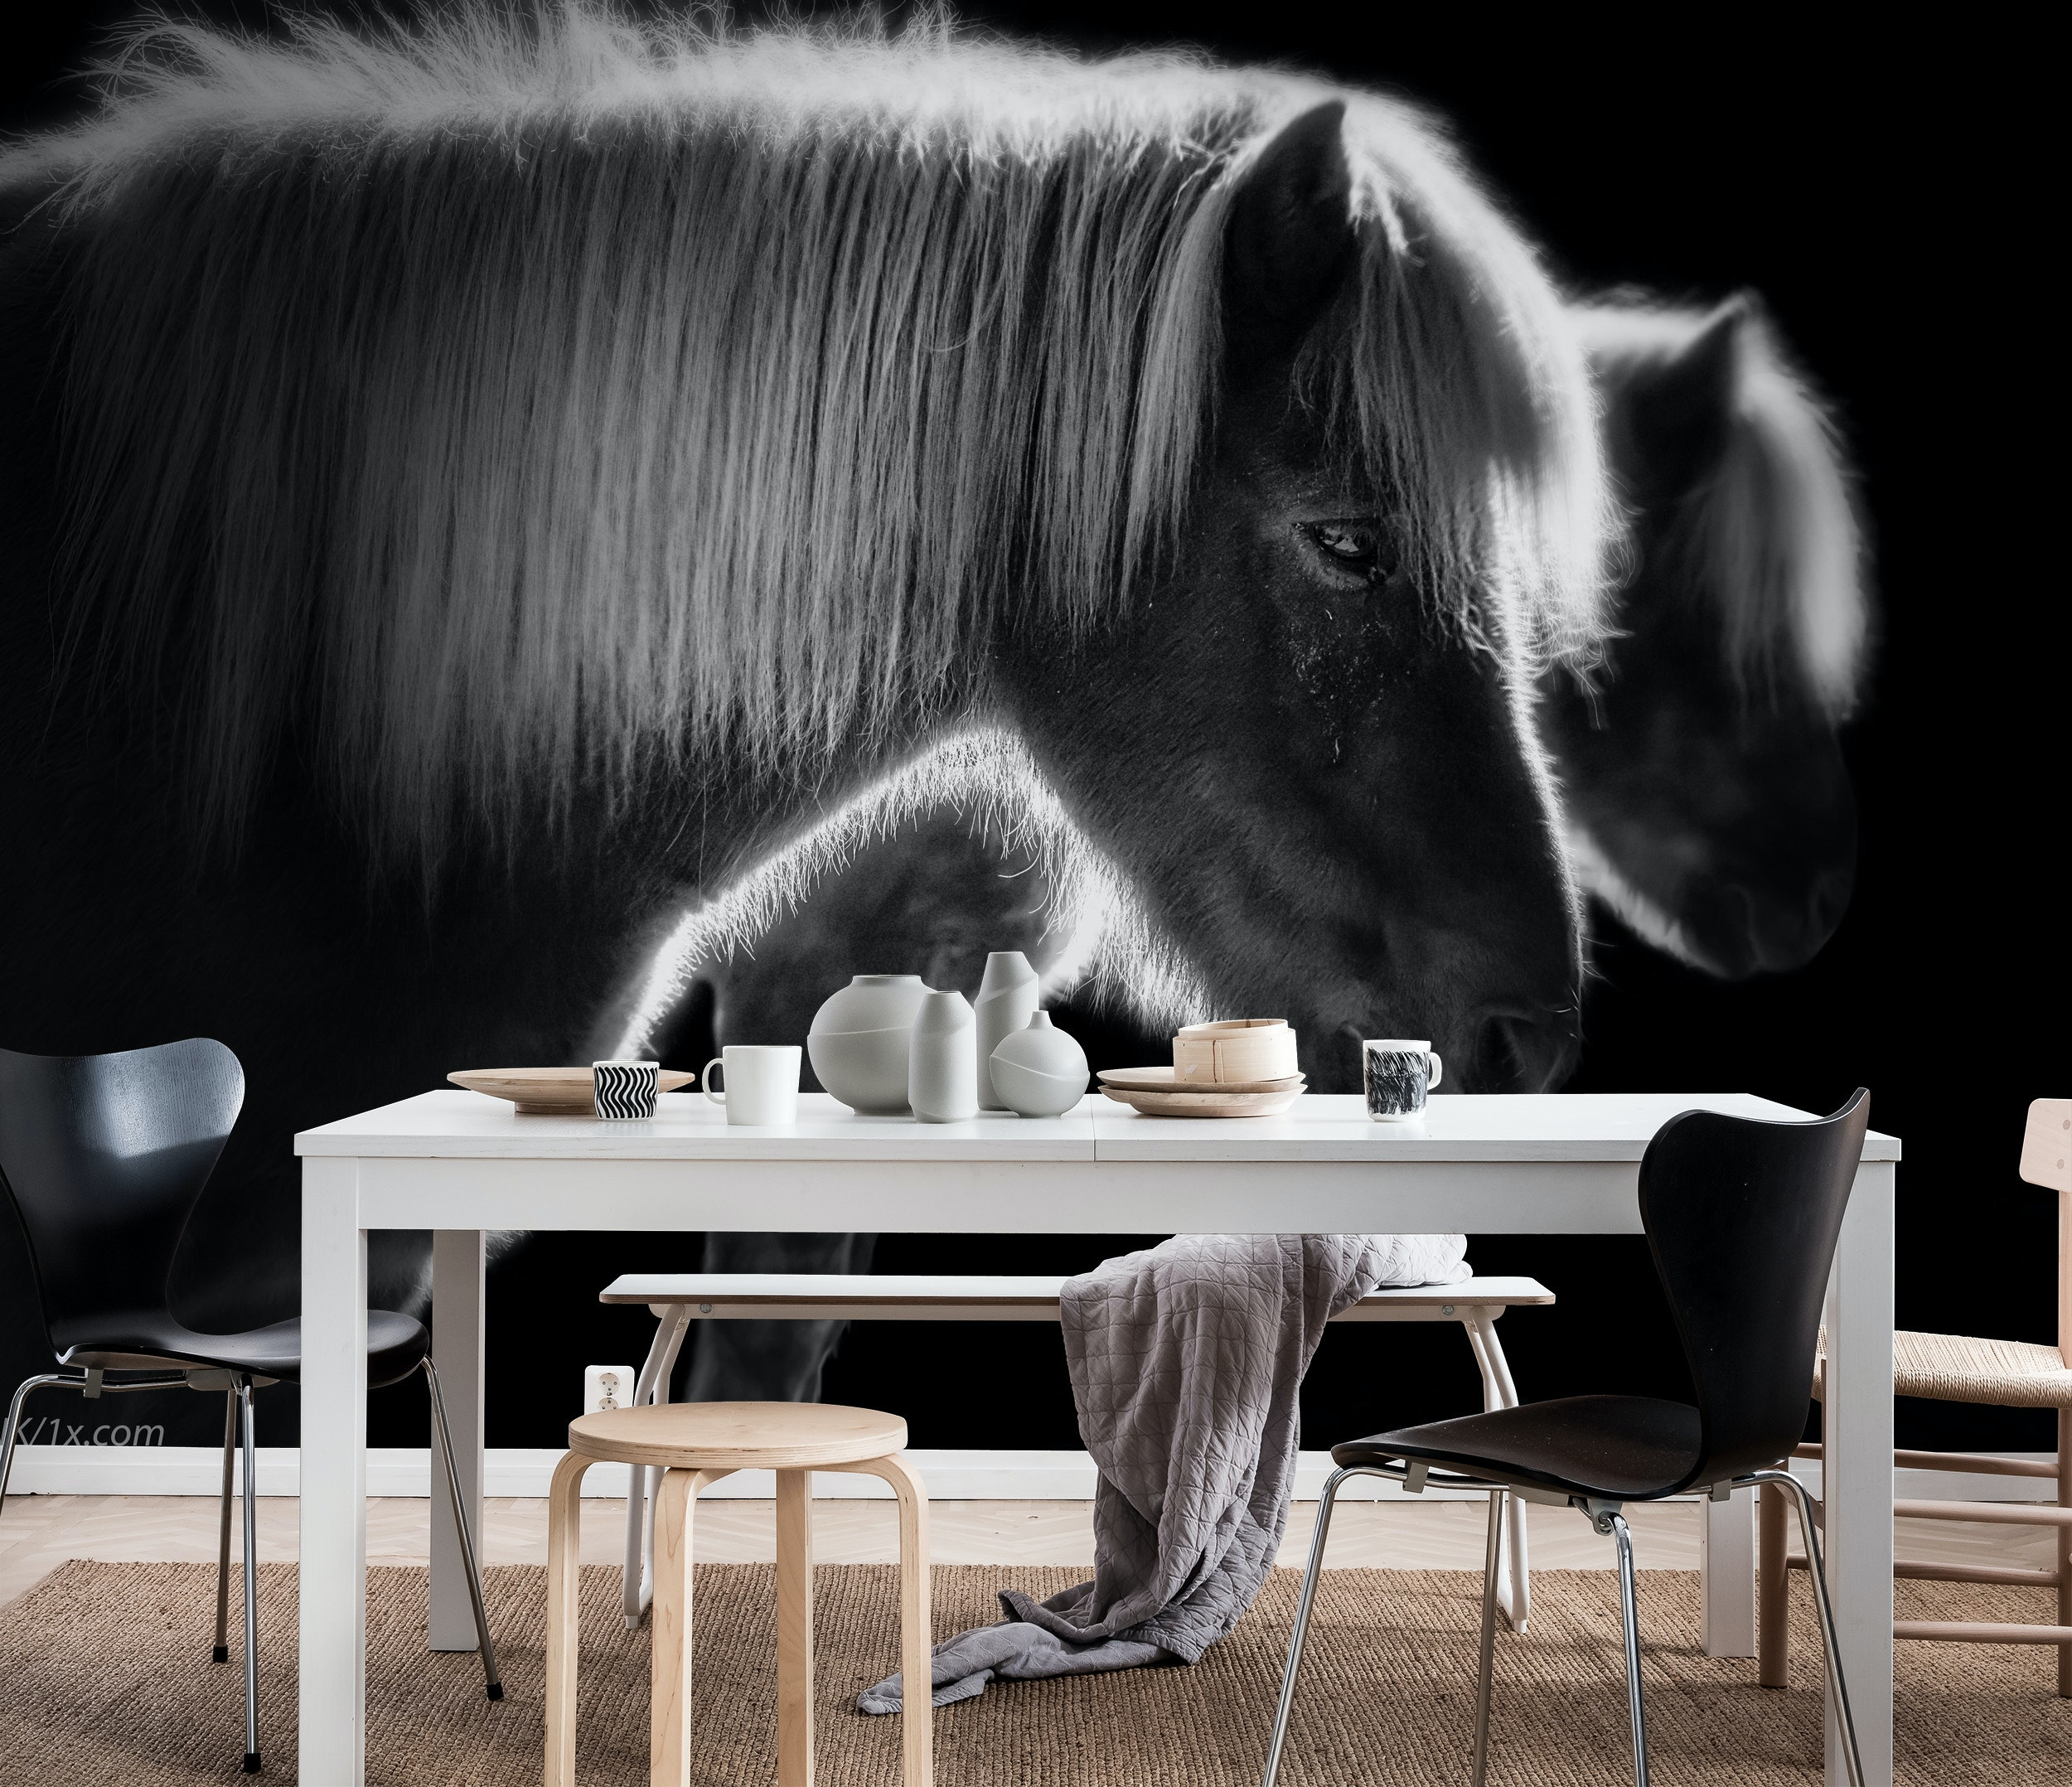 Buy Two Beautiful Horses Wallpaper Free Us Shipping At Happywall Com